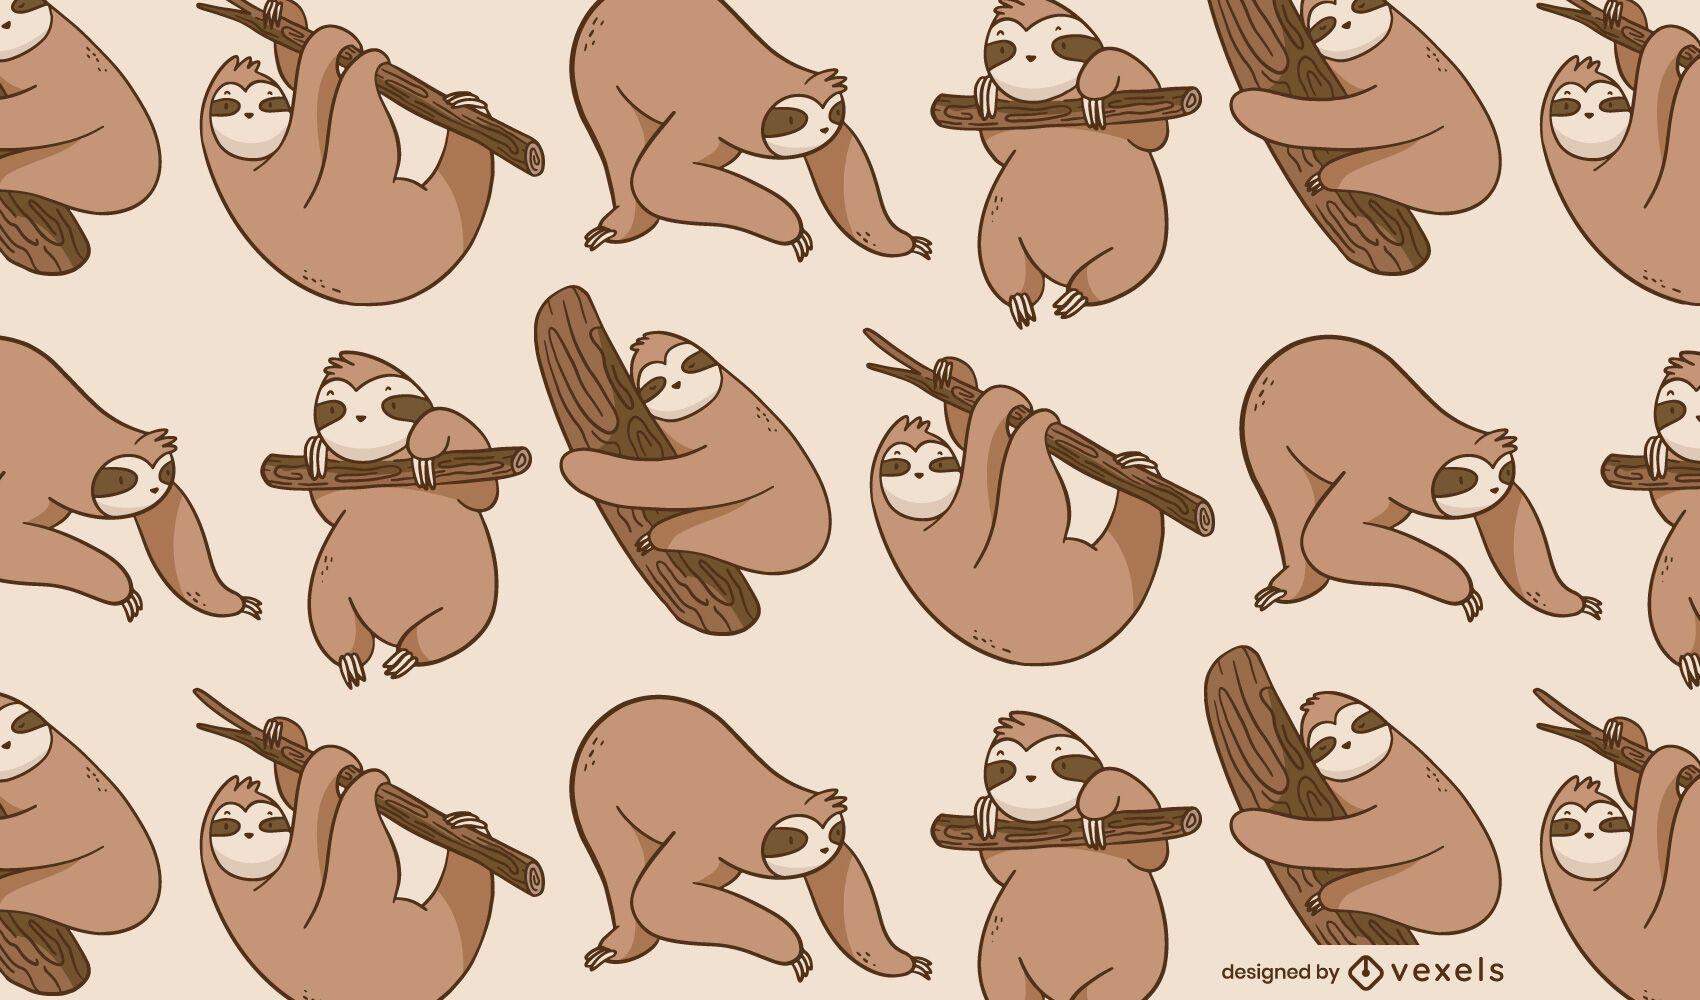 Sloth animal poses cute pattern design